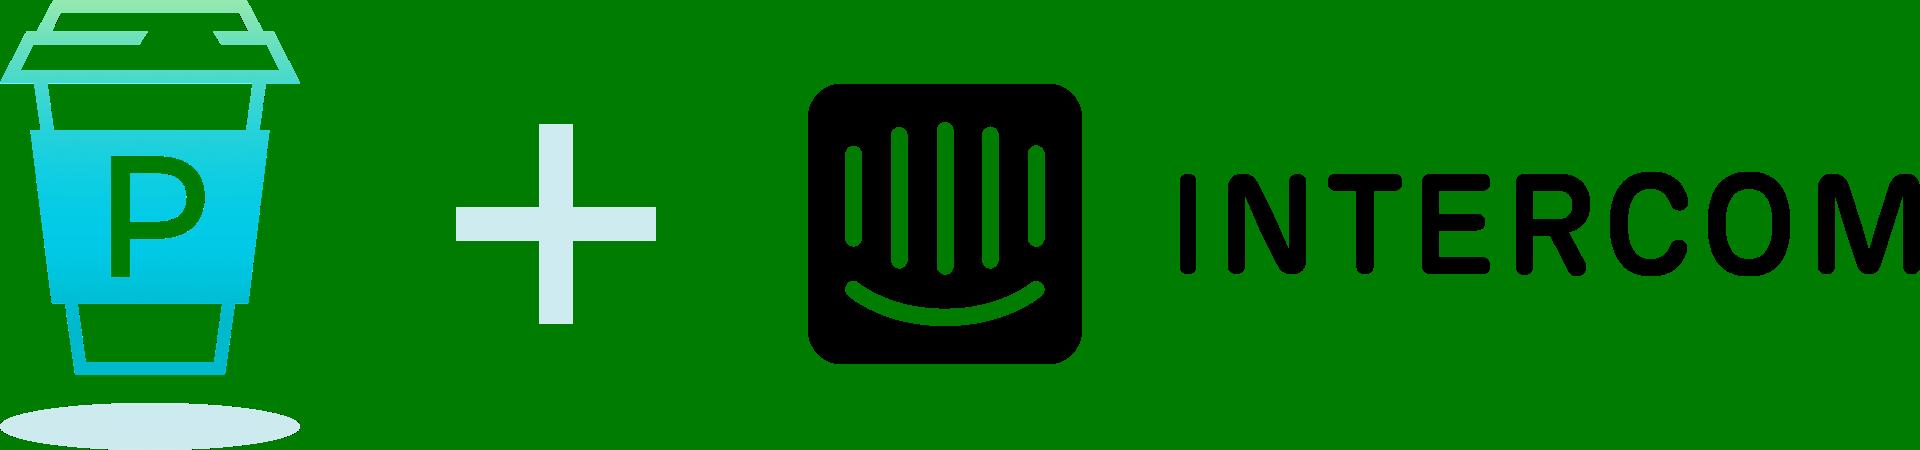 proposify and intercom logos